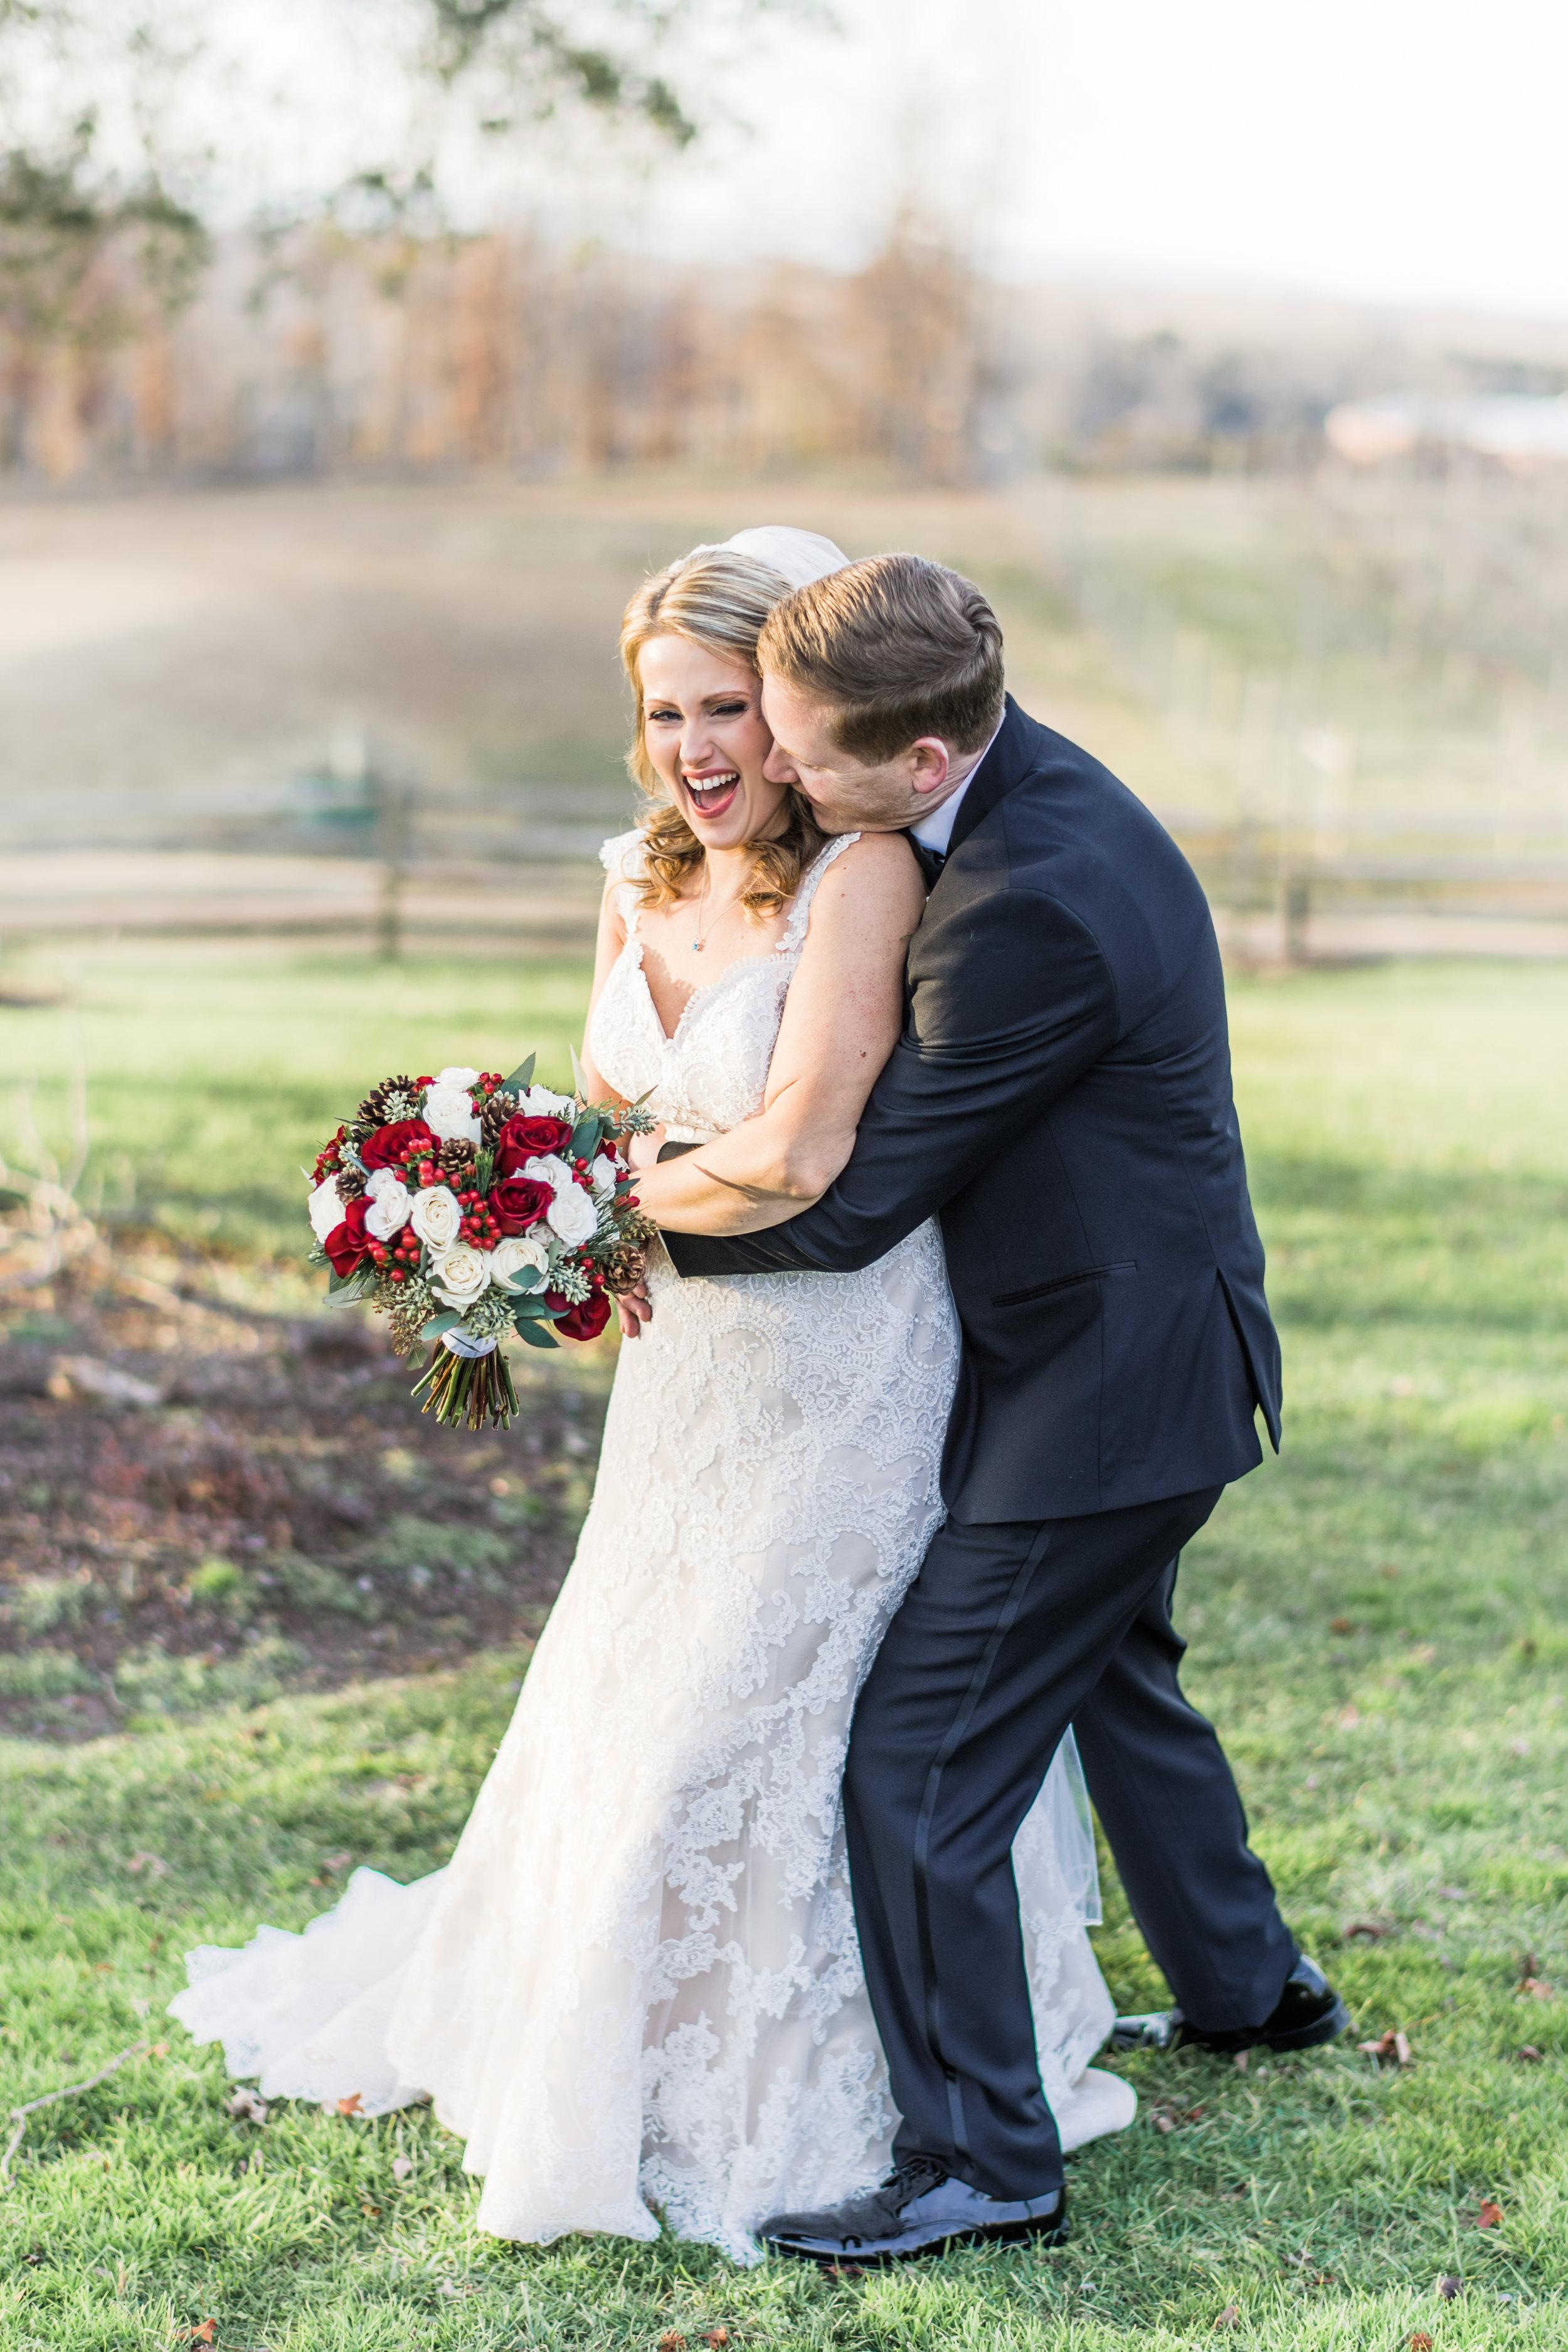 123018 VA Laura Ryder + Danny - Stephanie Messick Photgraphy EP-laurie-the-winery-at-bull-run-virginia-wedding-photographer-15.jpg